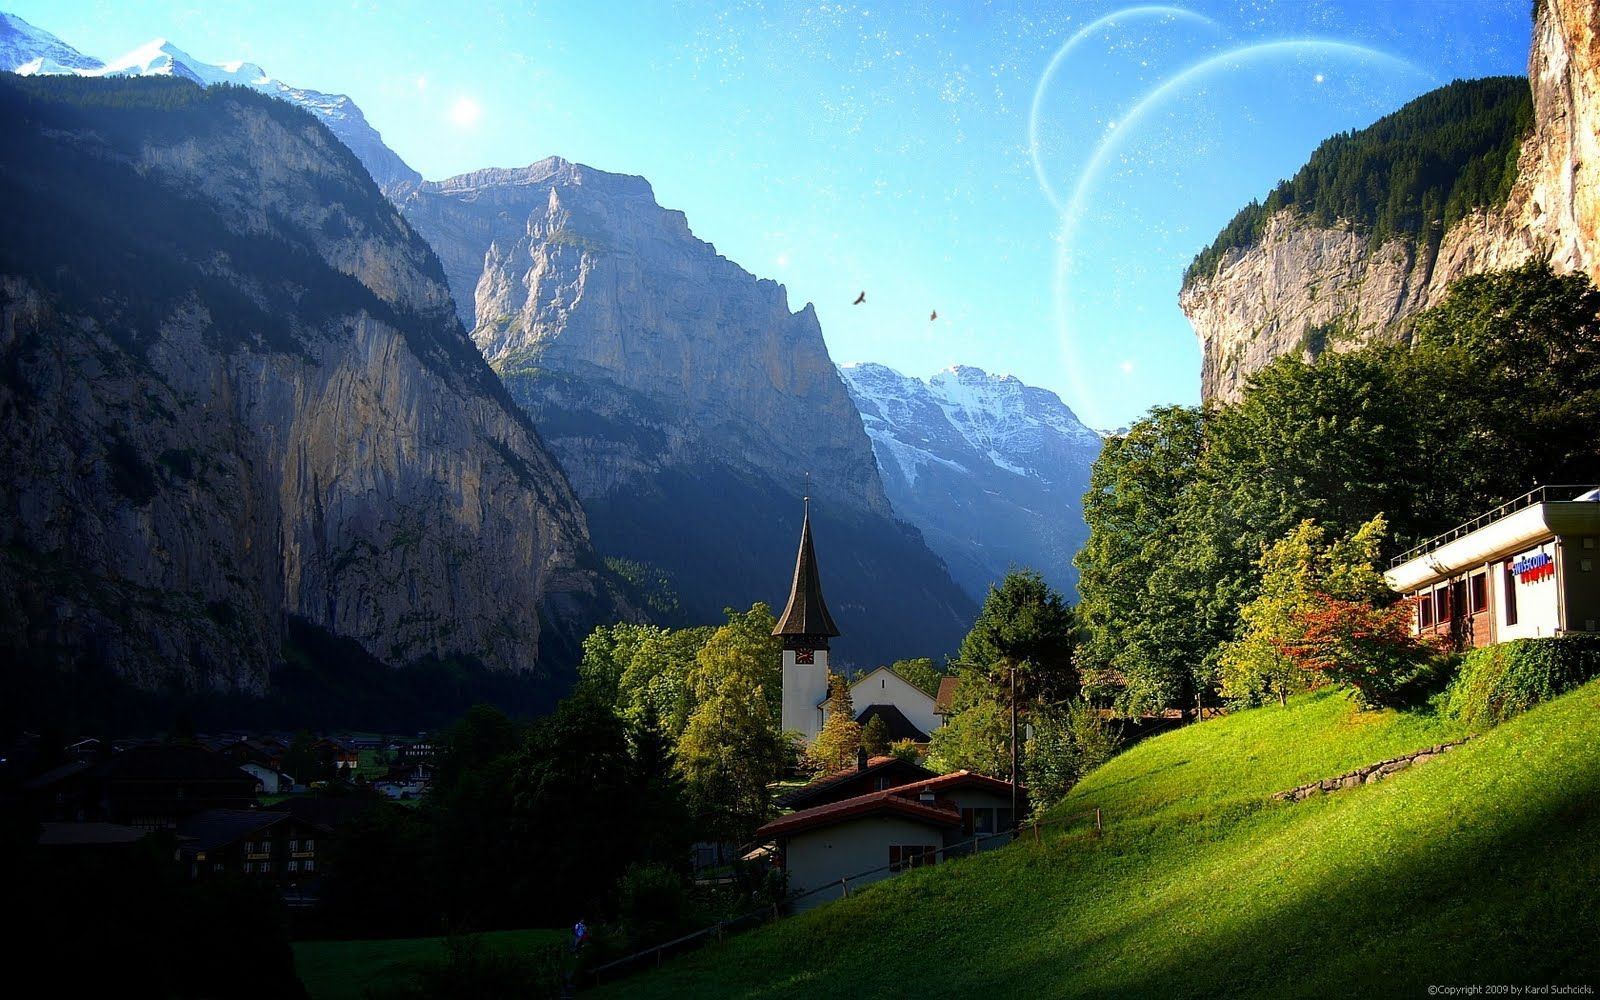 paisaje natural hd 1080p - Buscar con Google